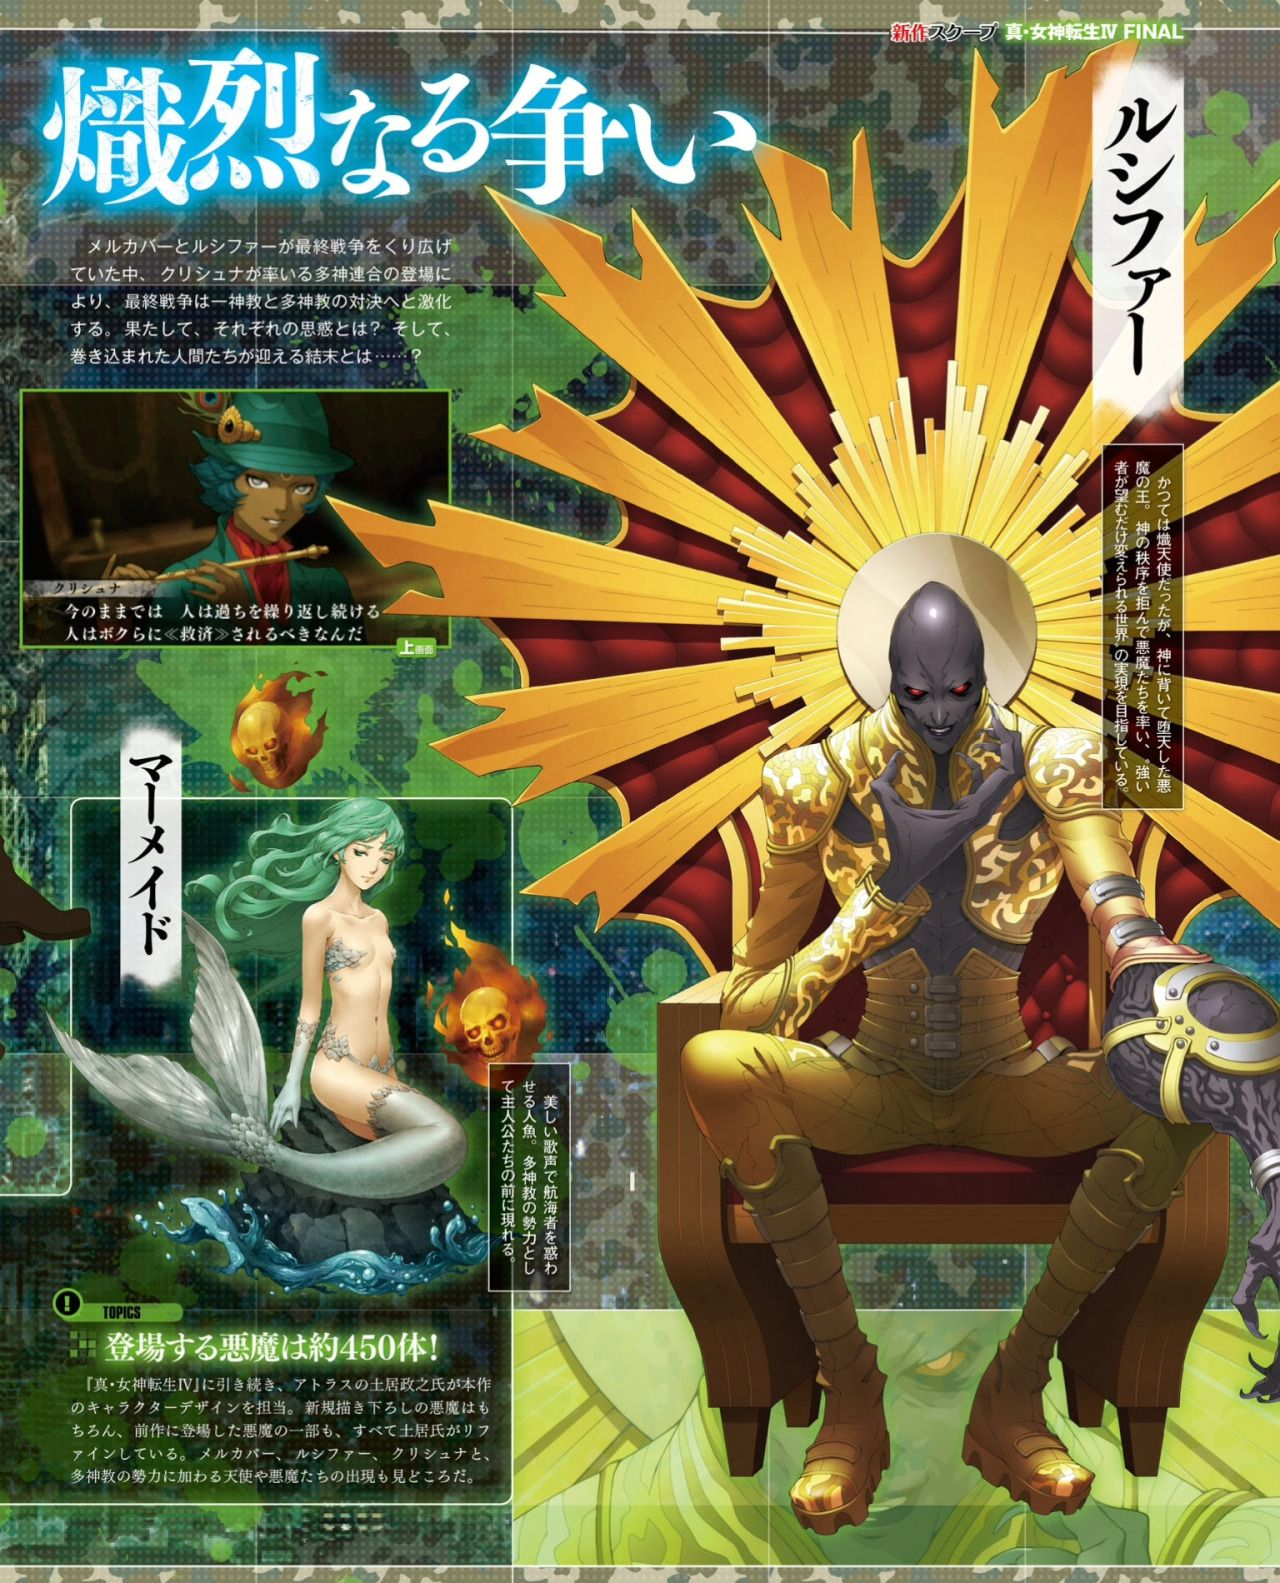 Lucifer Krishna And Mermaid In Shin Megami Tensei Iv Final